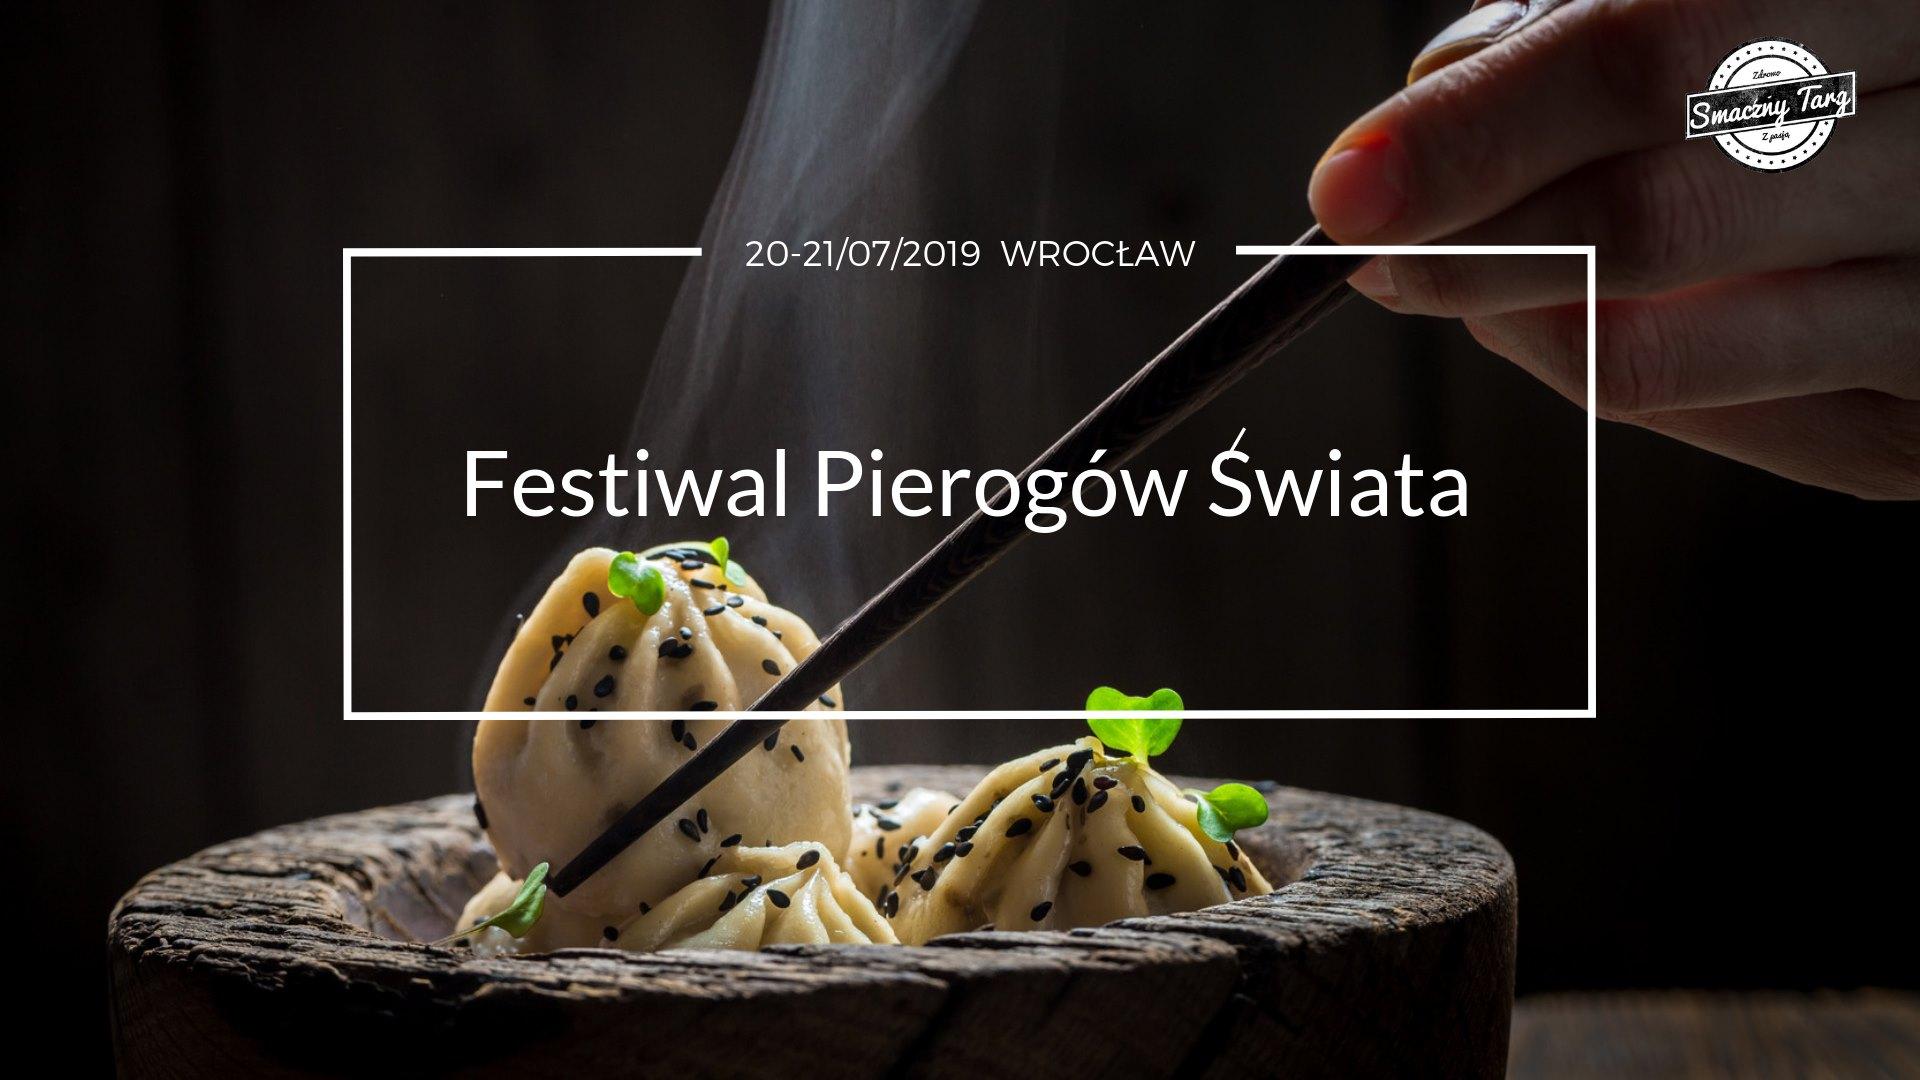 festiwal pierogów we Wrocławiu